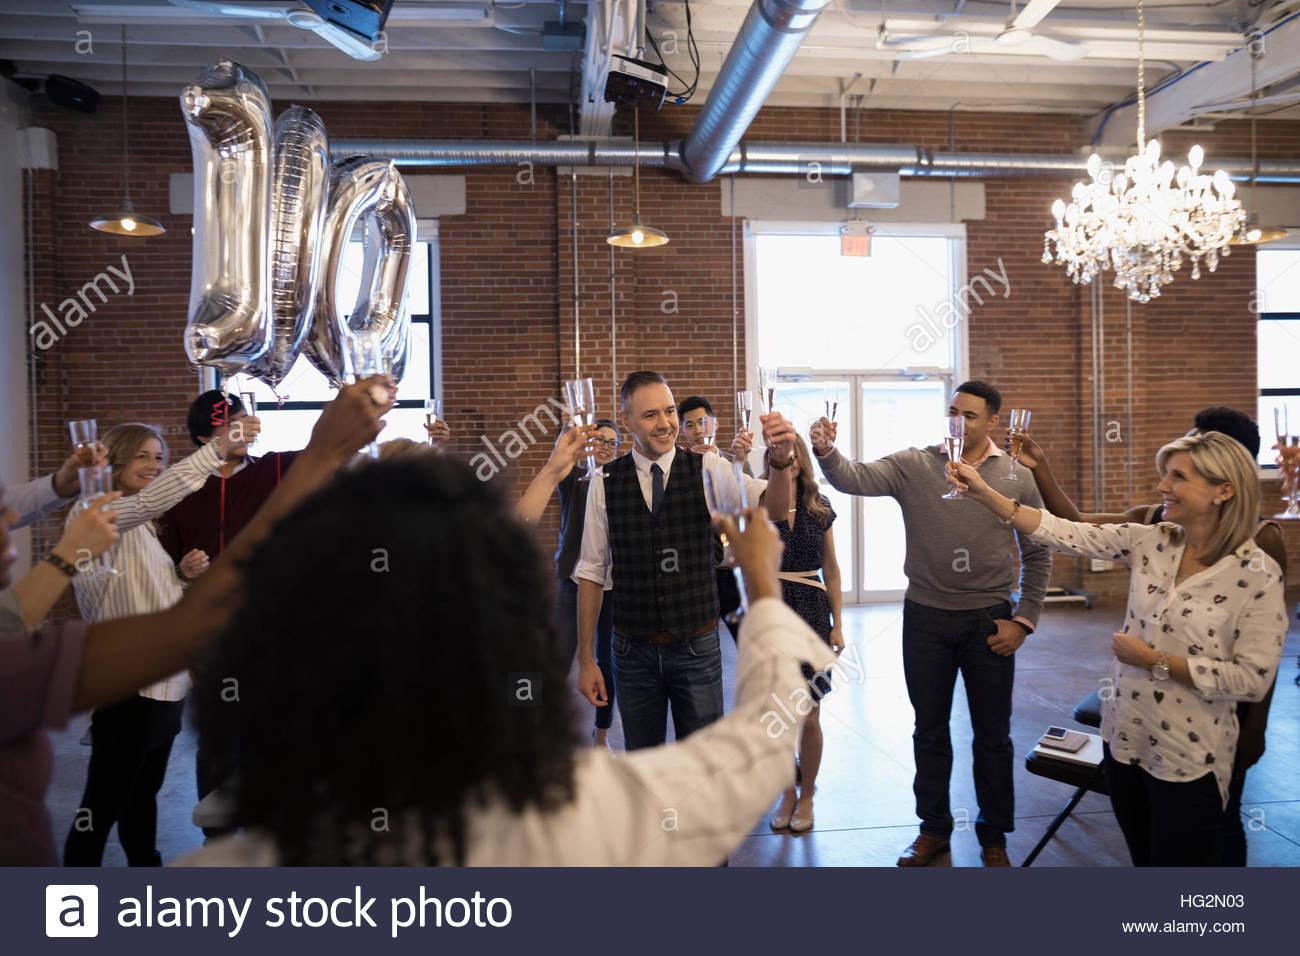 Business people celebrating milestone toasting champagne - Stock Image